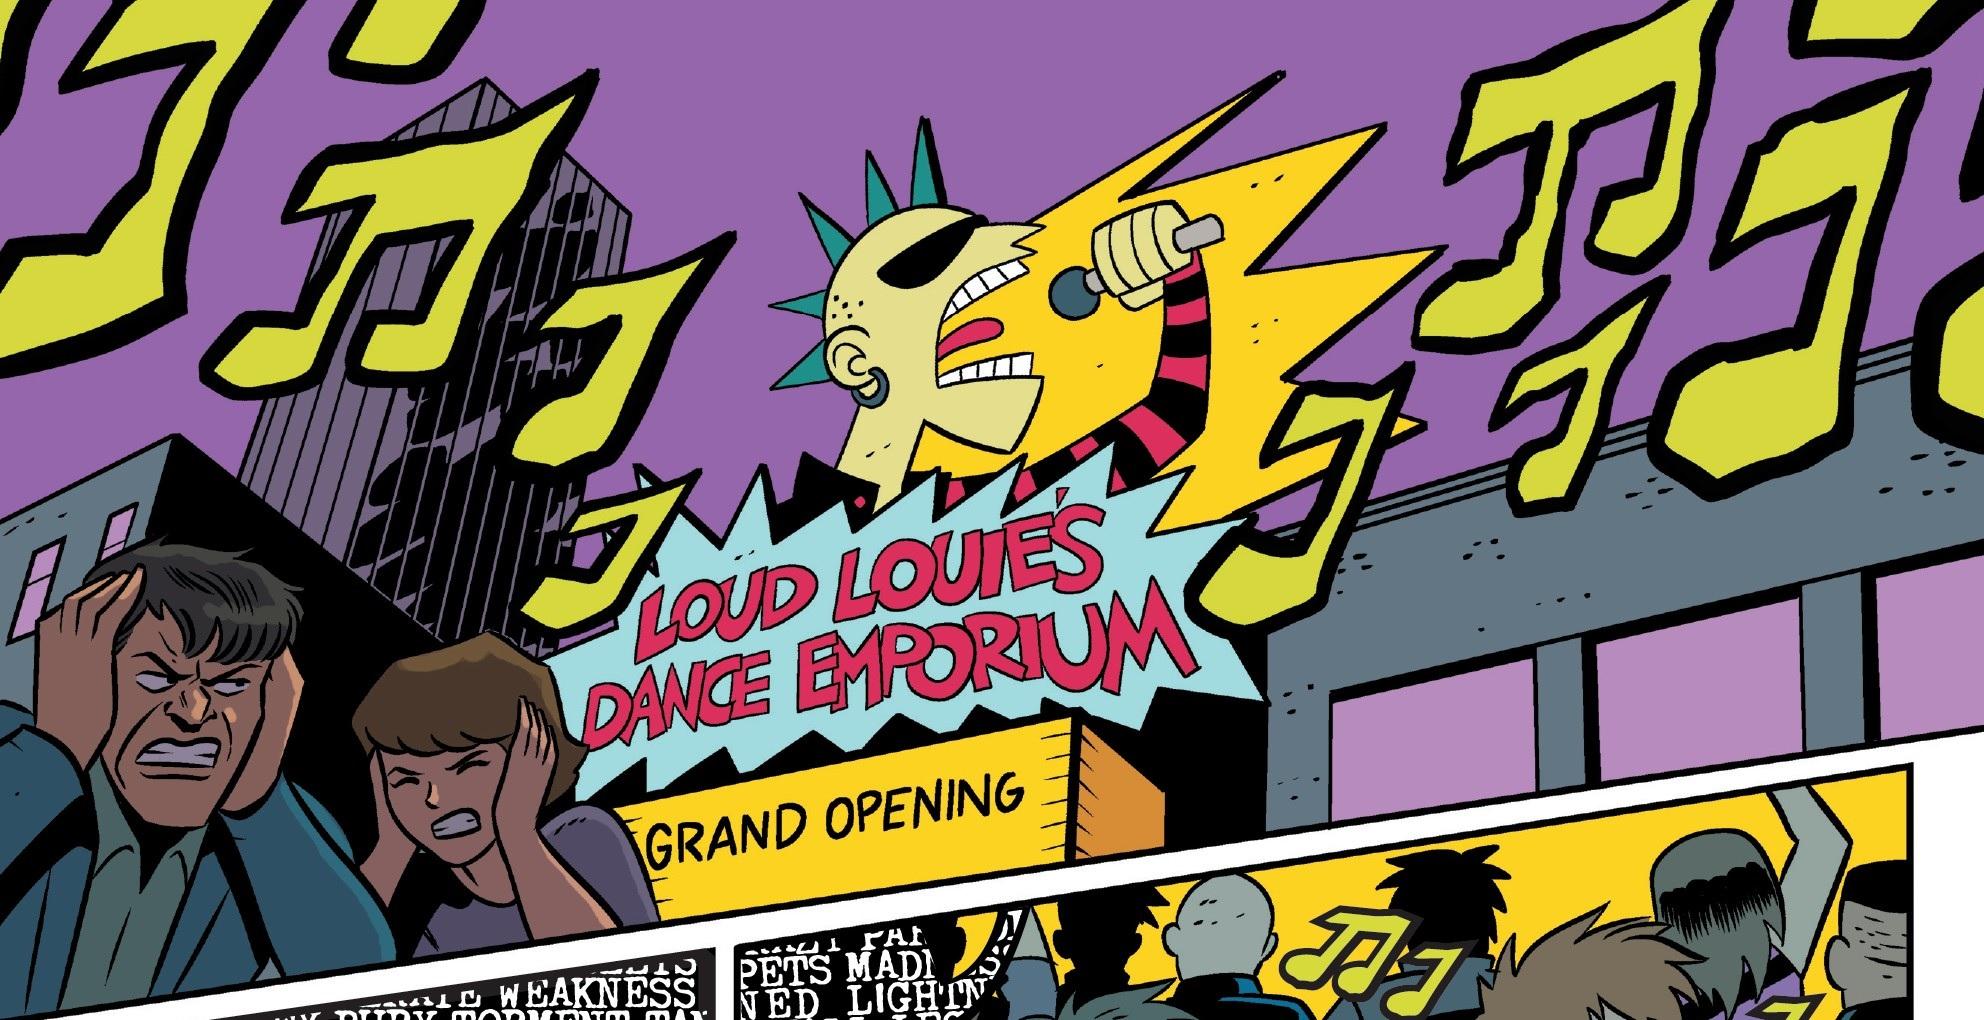 Loud Louie's Dance Emporium